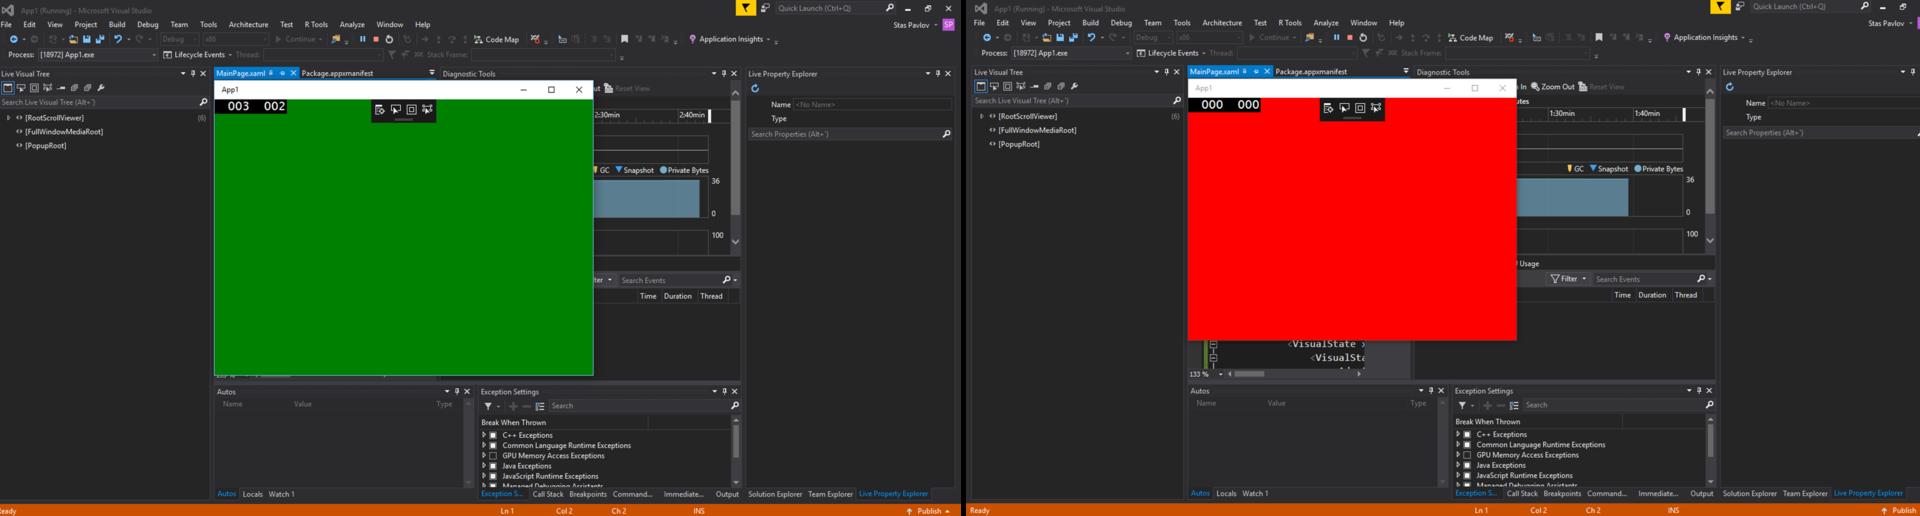 UWP beginner: Адаптивный дизайн (VB.NET + C#) - 2